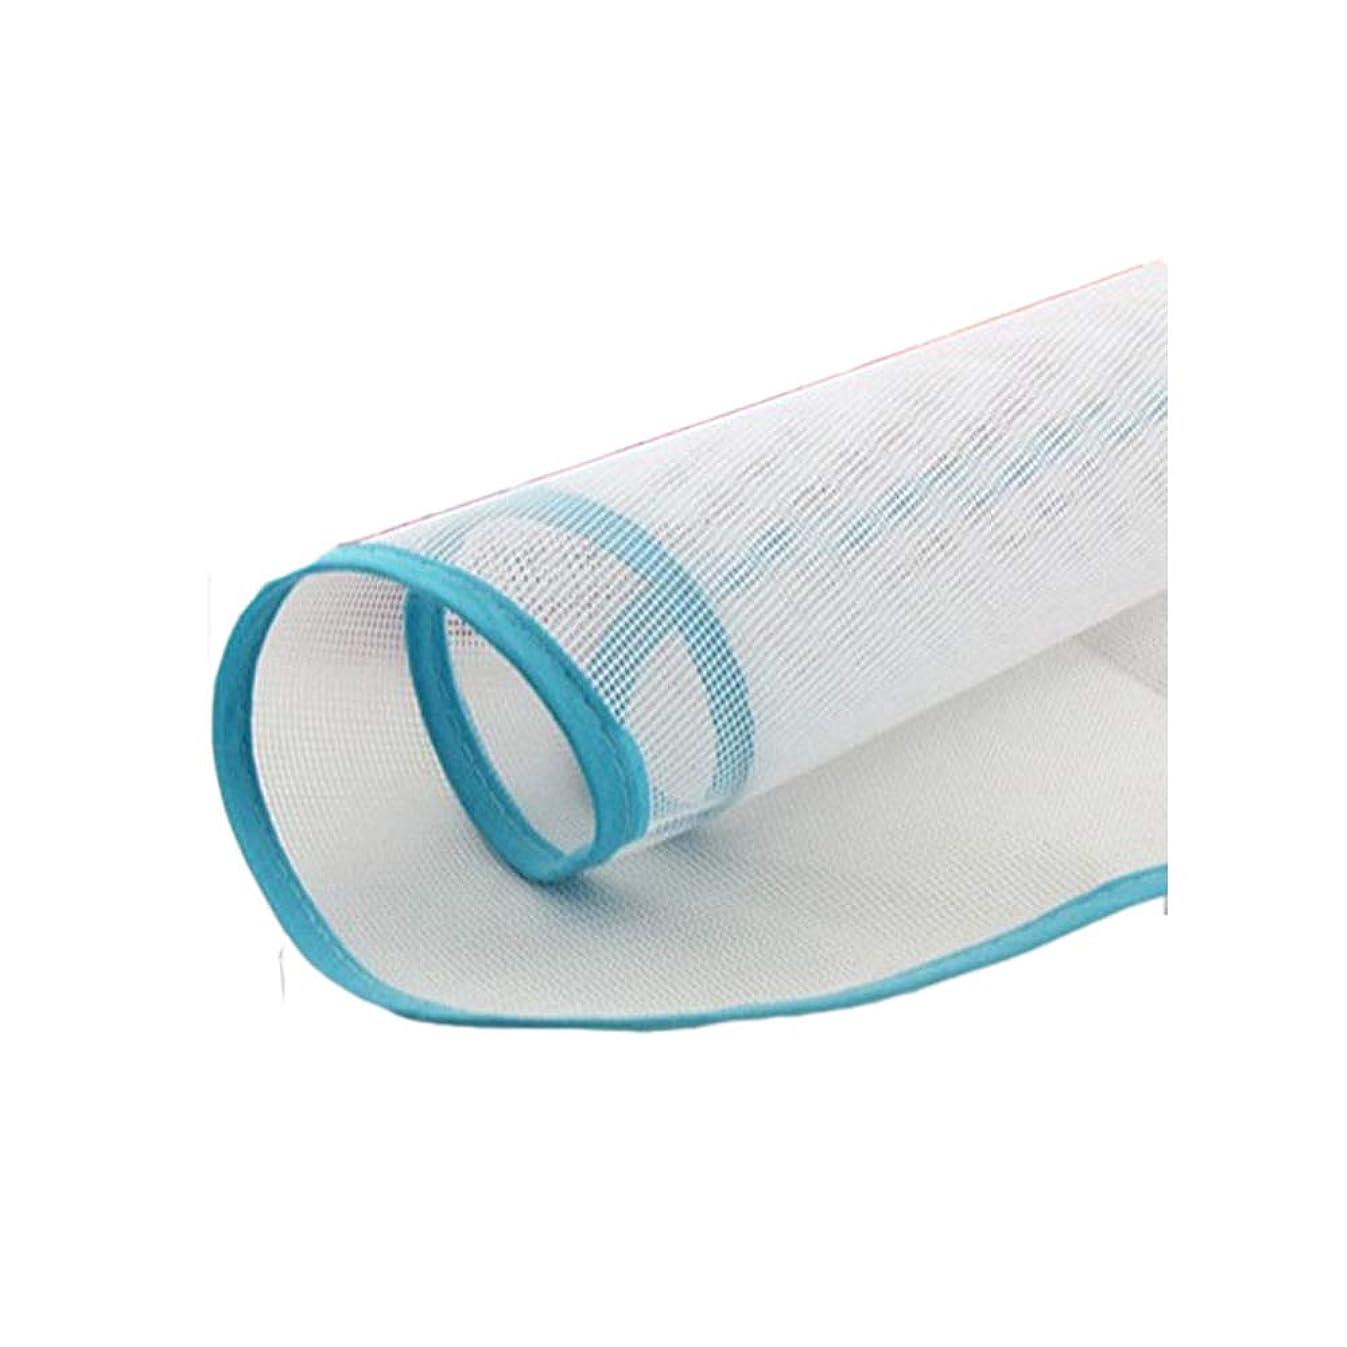 Sohapy 10 Pack Protective Ironing Scorch-Saving Mesh Pressing Pad Mesh Cloth